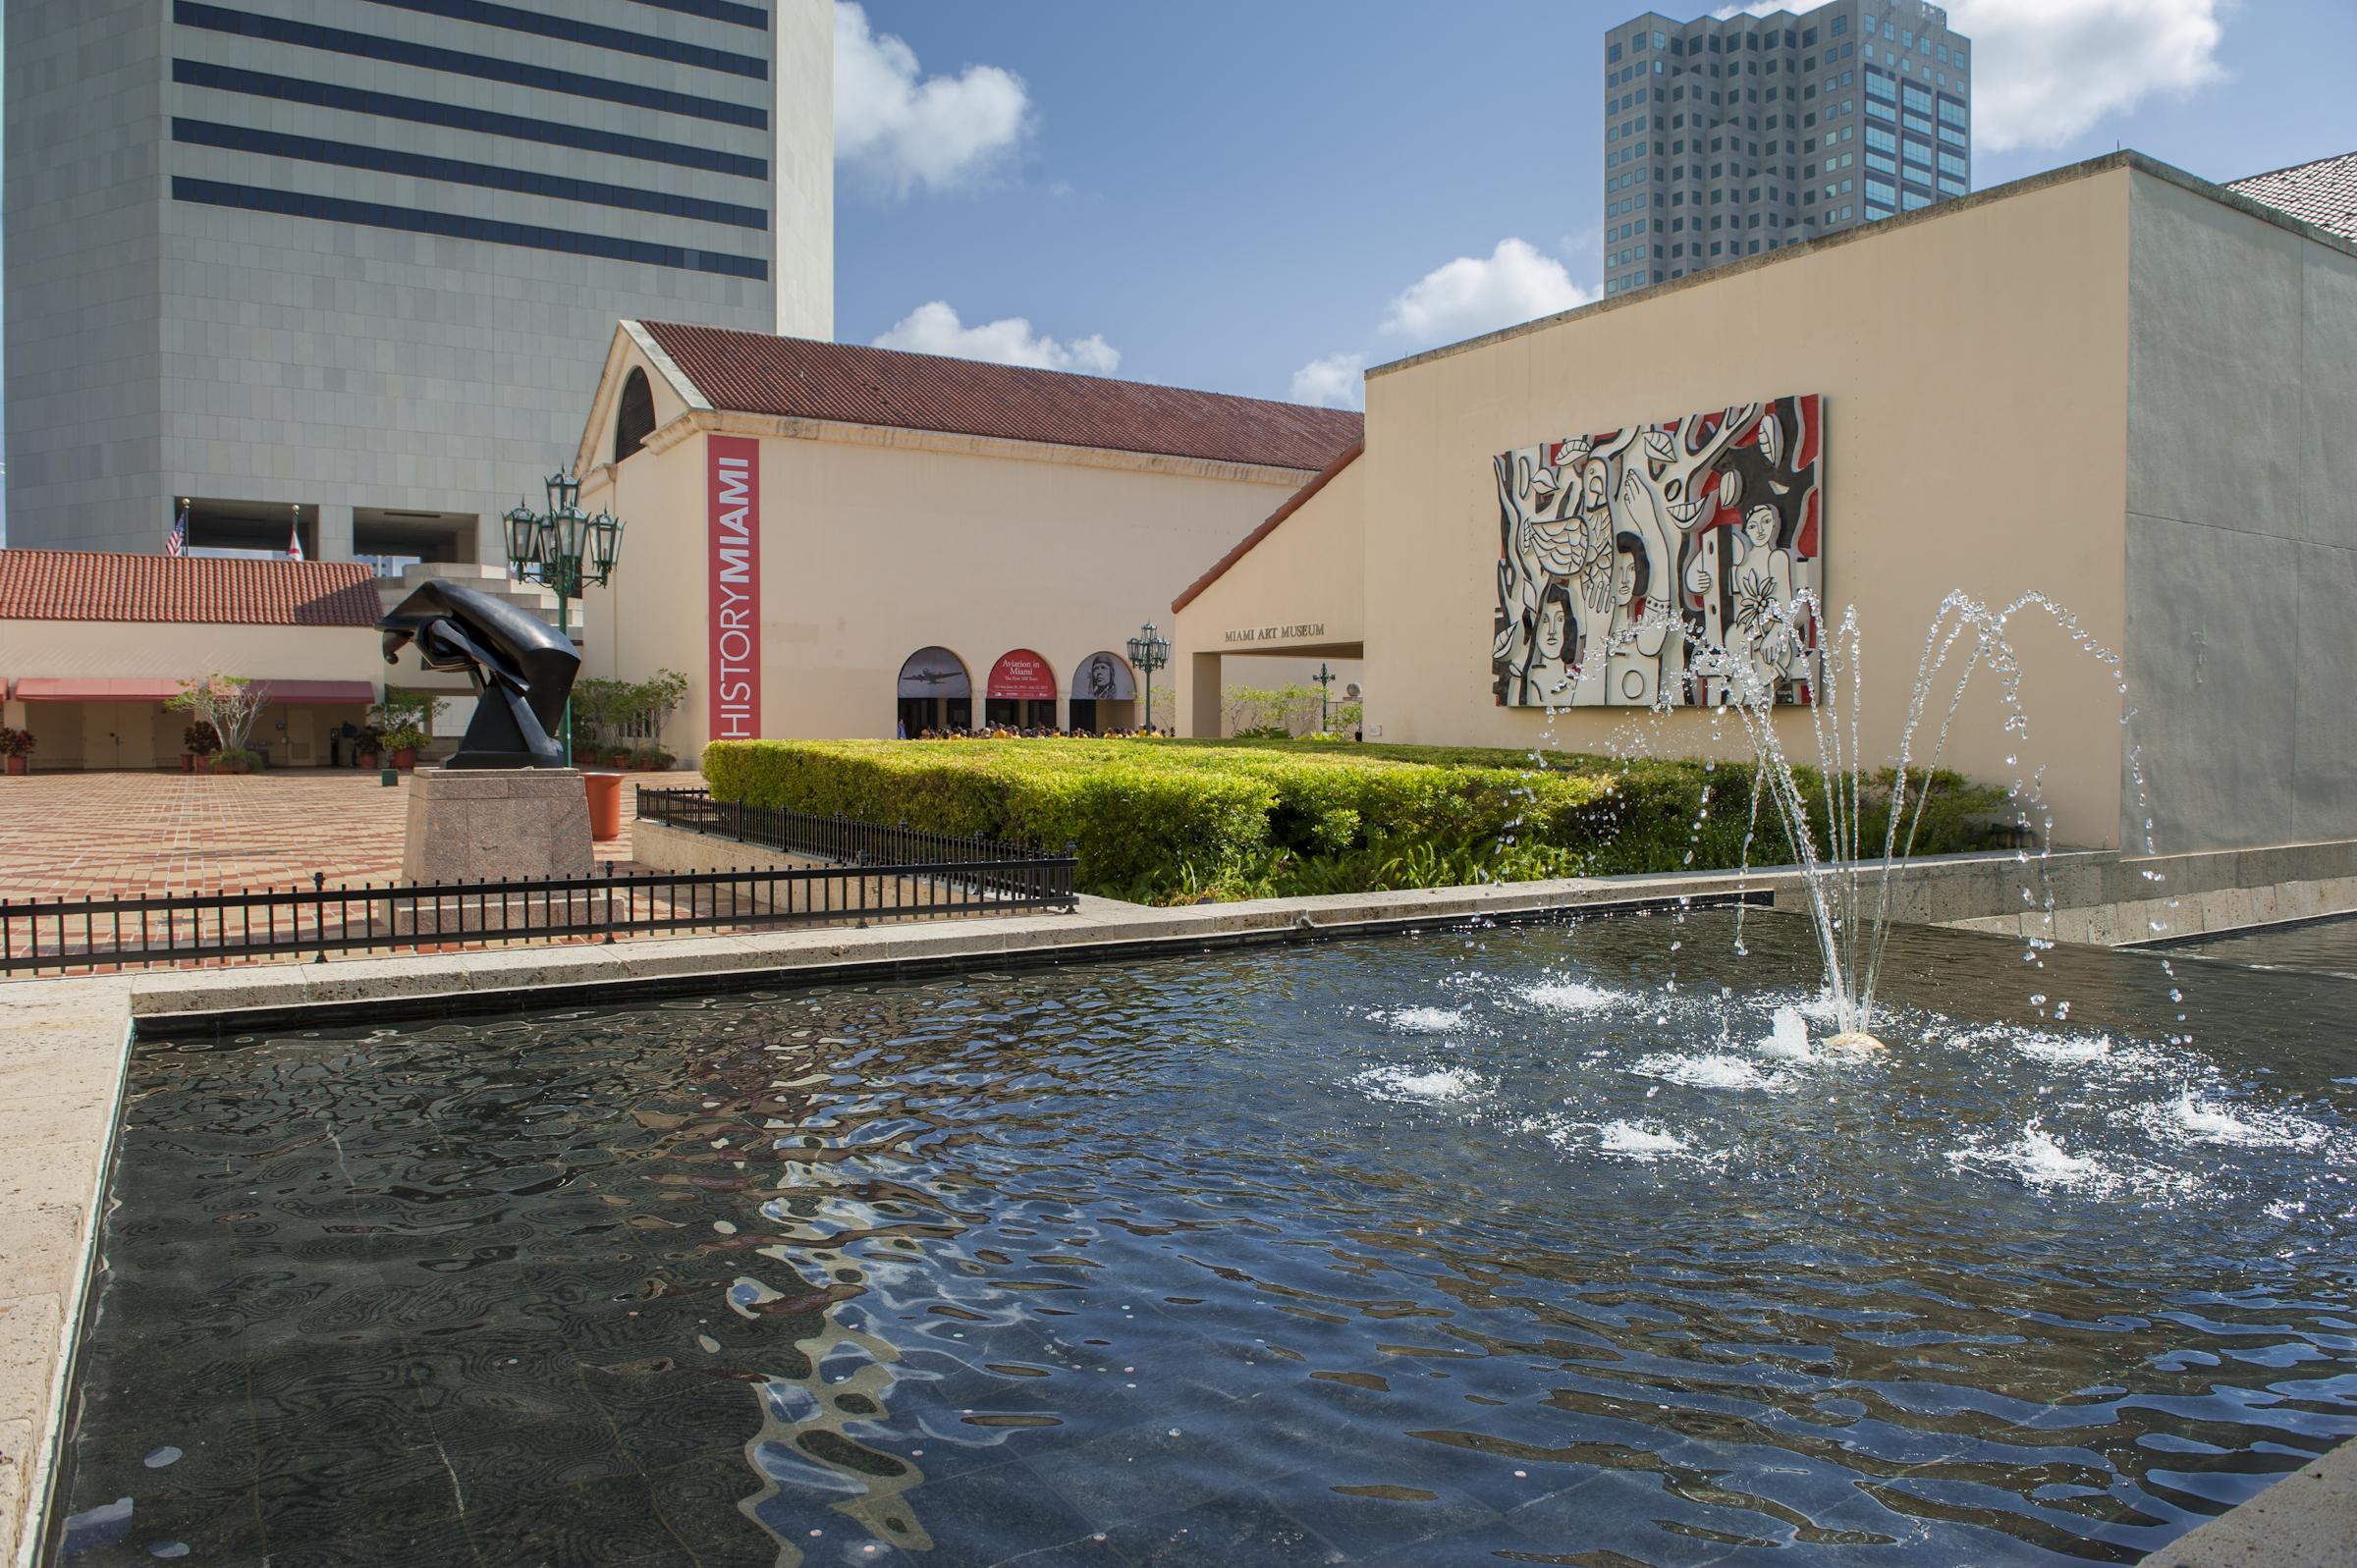 HistoryMiami Museum courtyard fountain.jpg